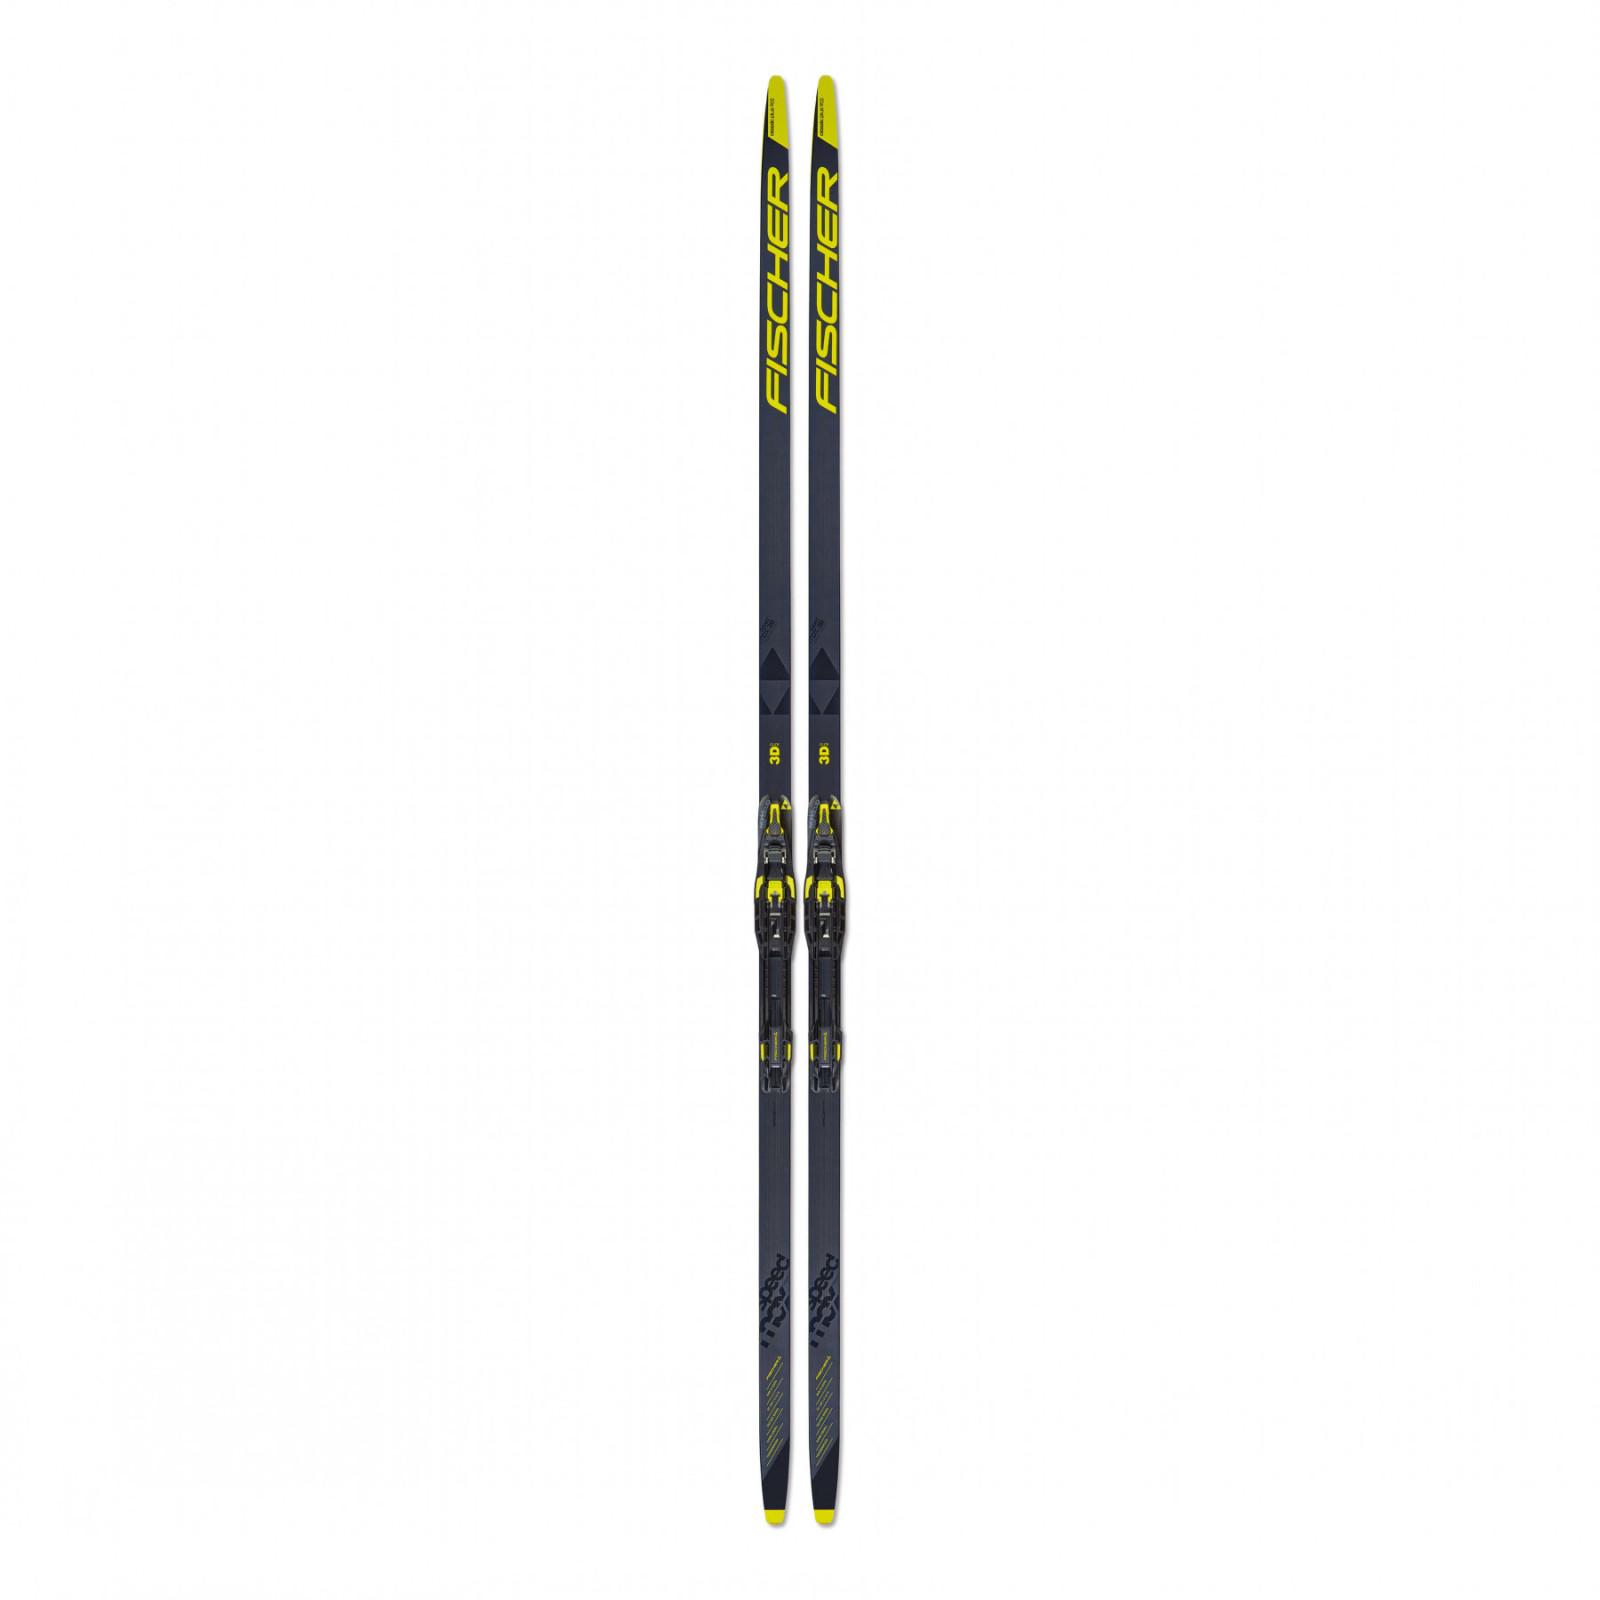 Závodní běžecké lyže Fischer Speedmax 3D Classic Plus 902 Medium